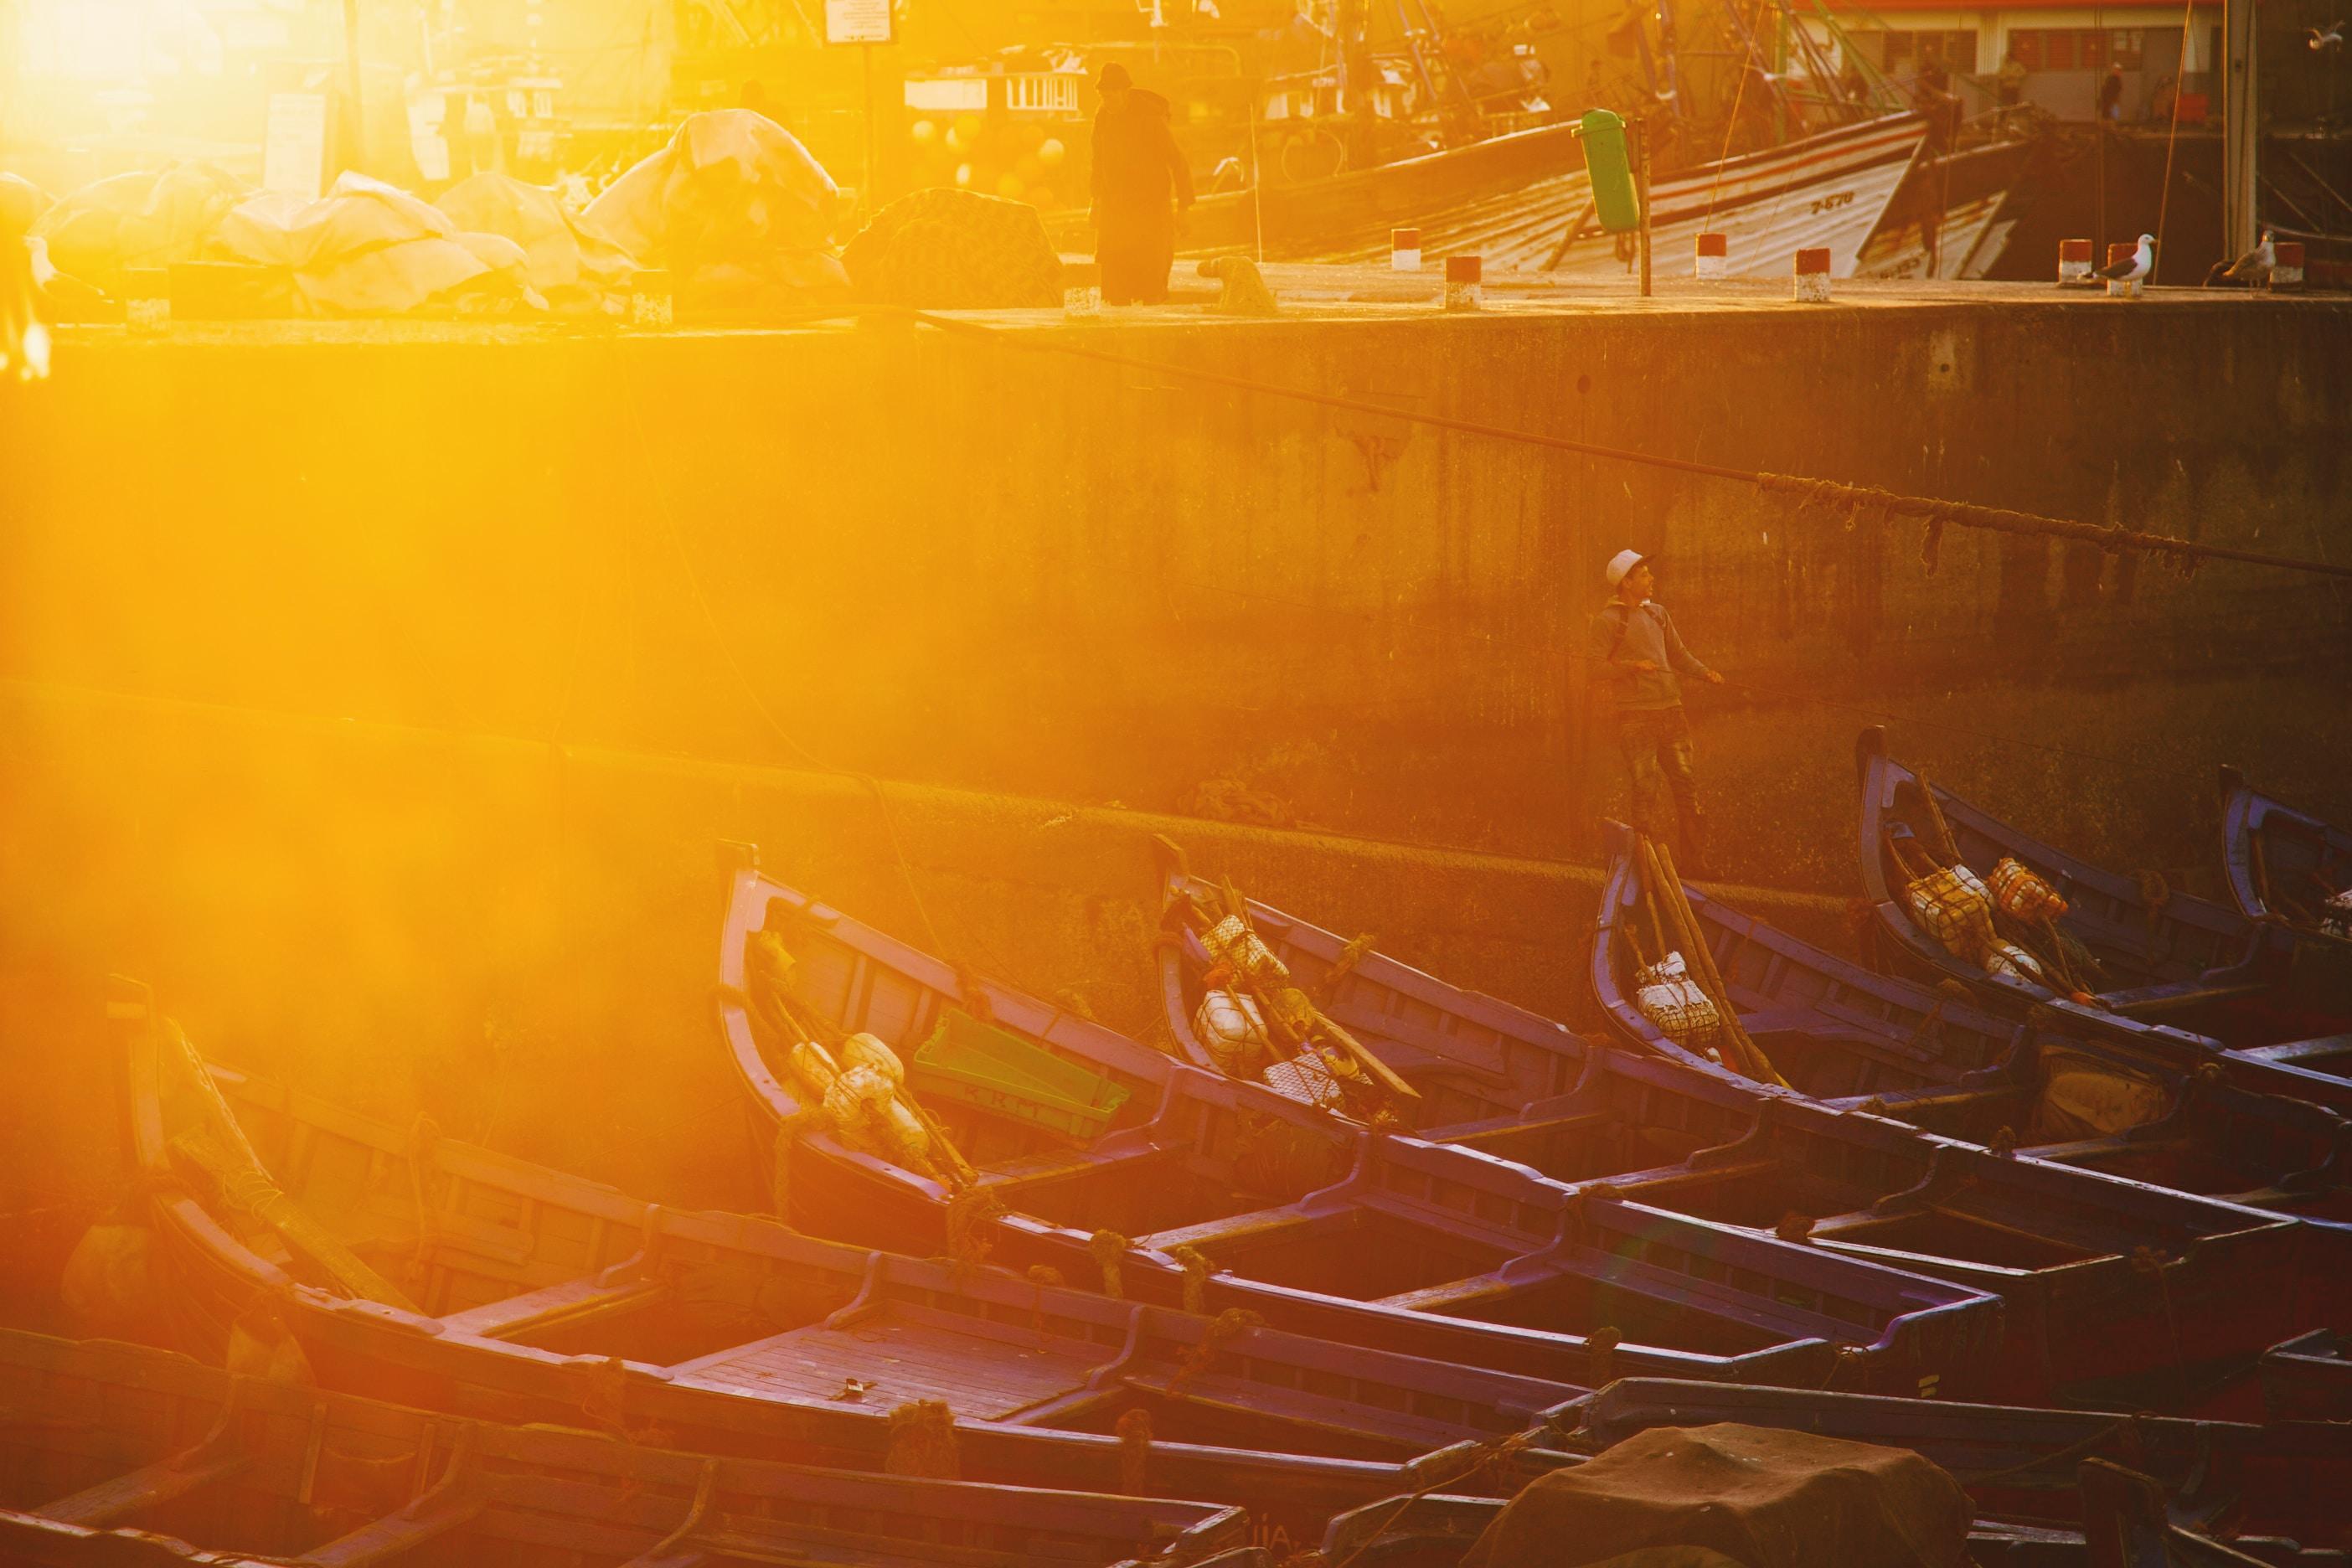 canoe boats on body of water